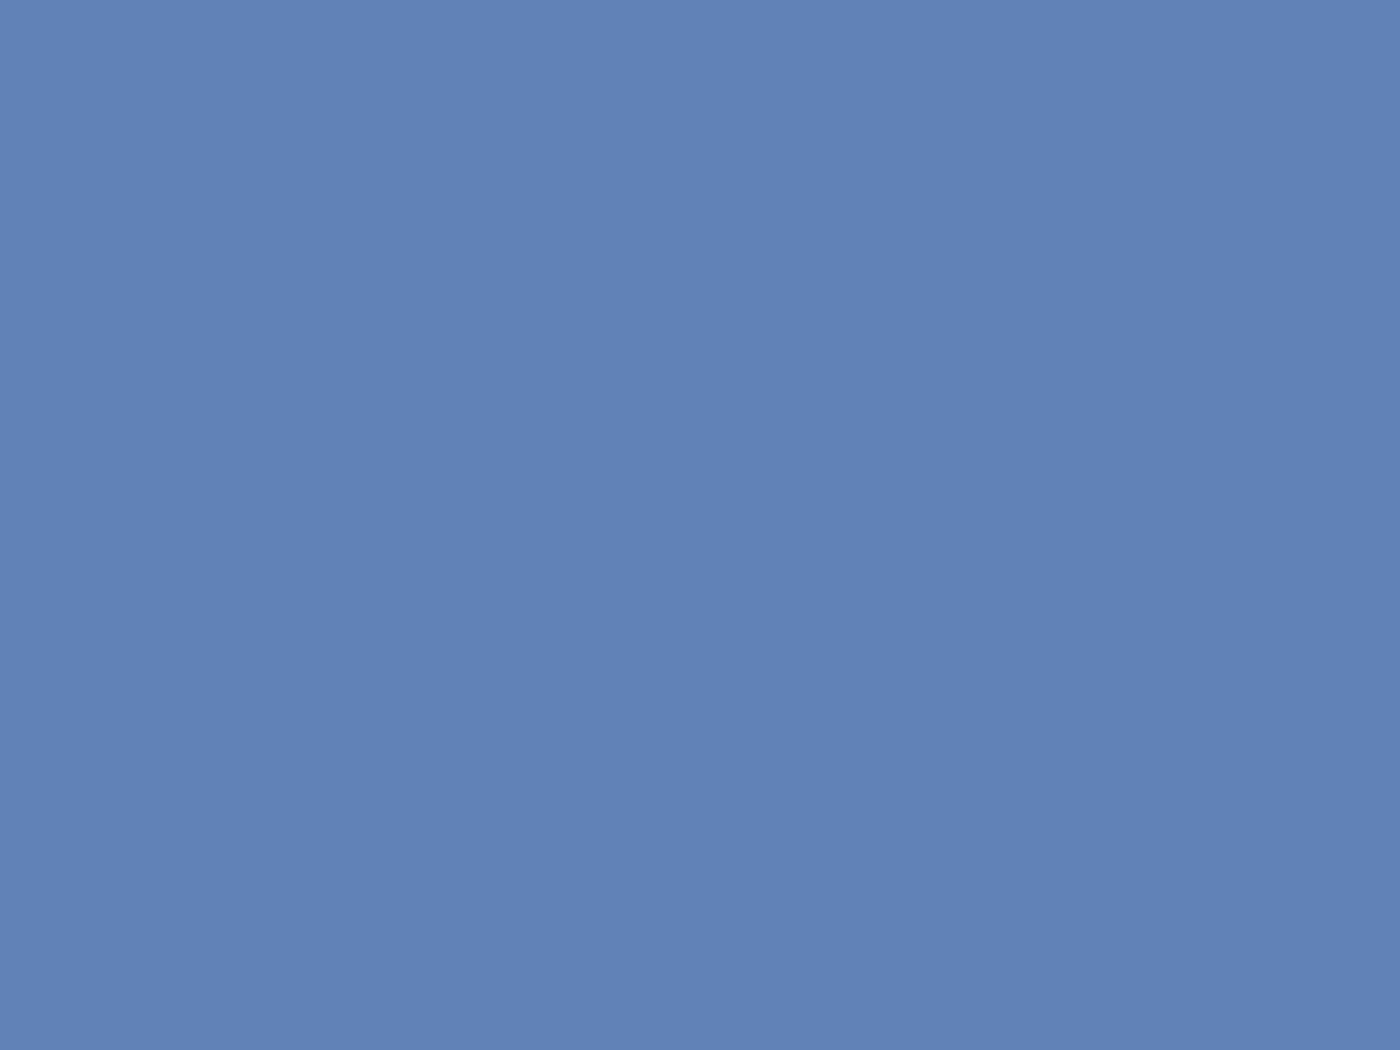 1400x1050 Glaucous Solid Color Background